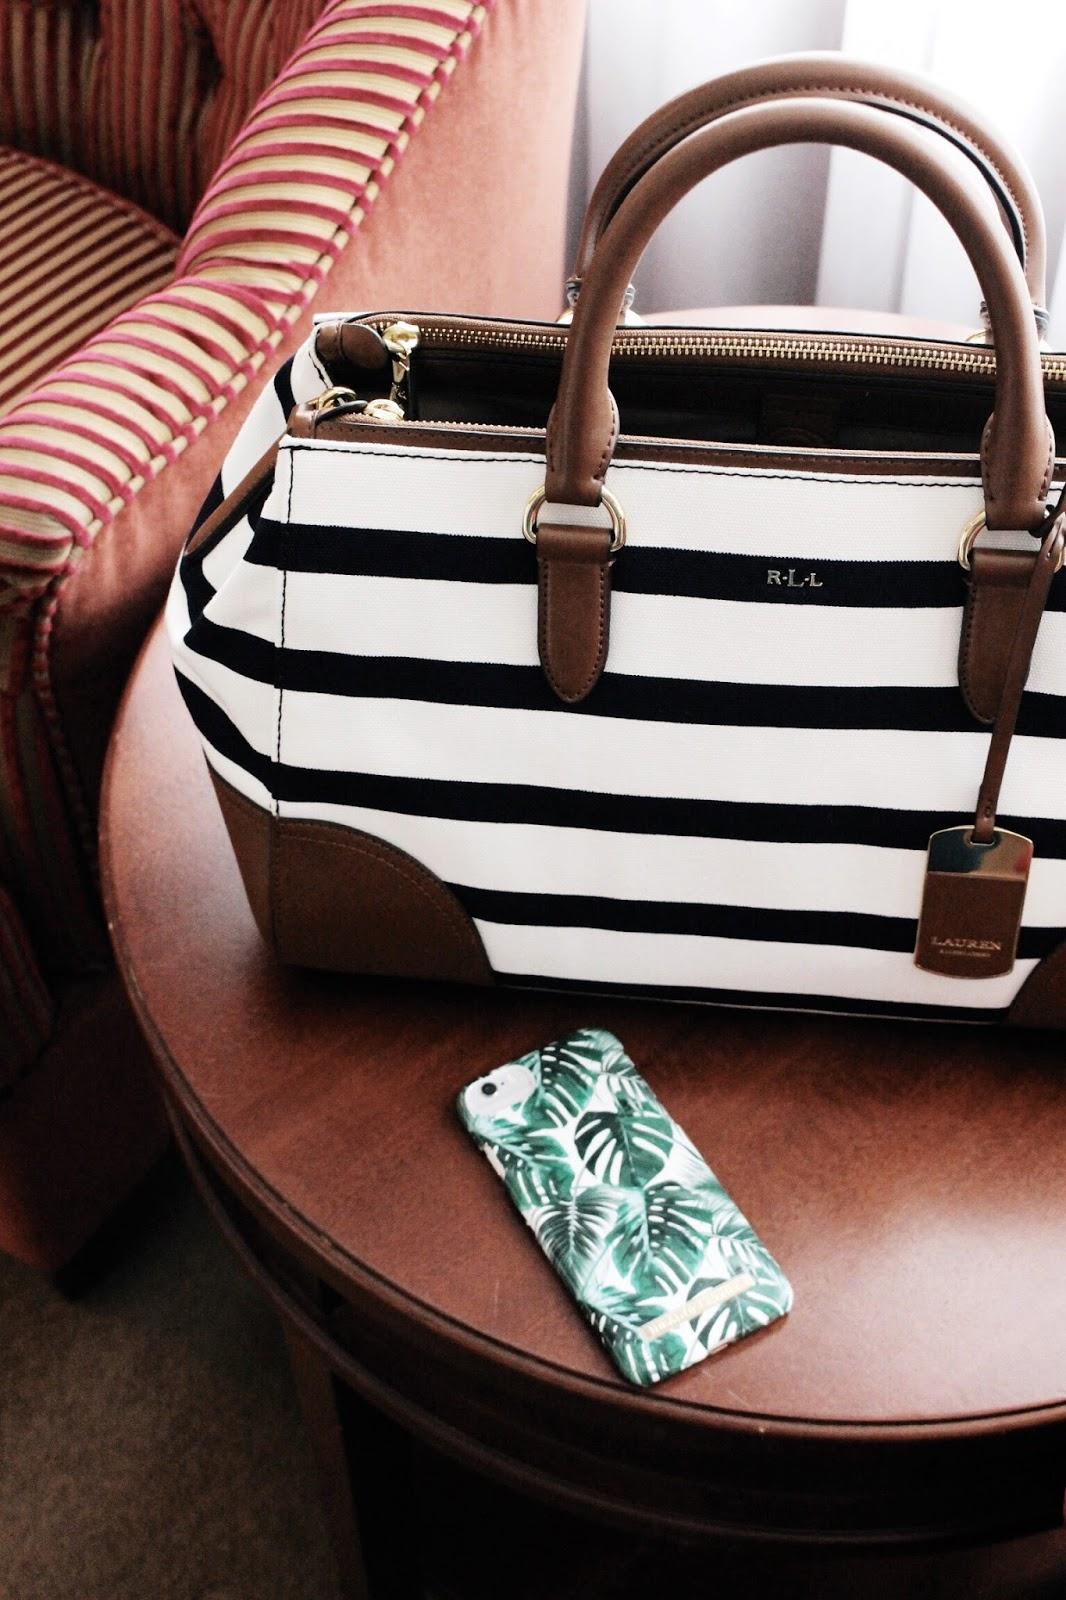 Ralph Lauren Blue Tan White Striped Tote Bag